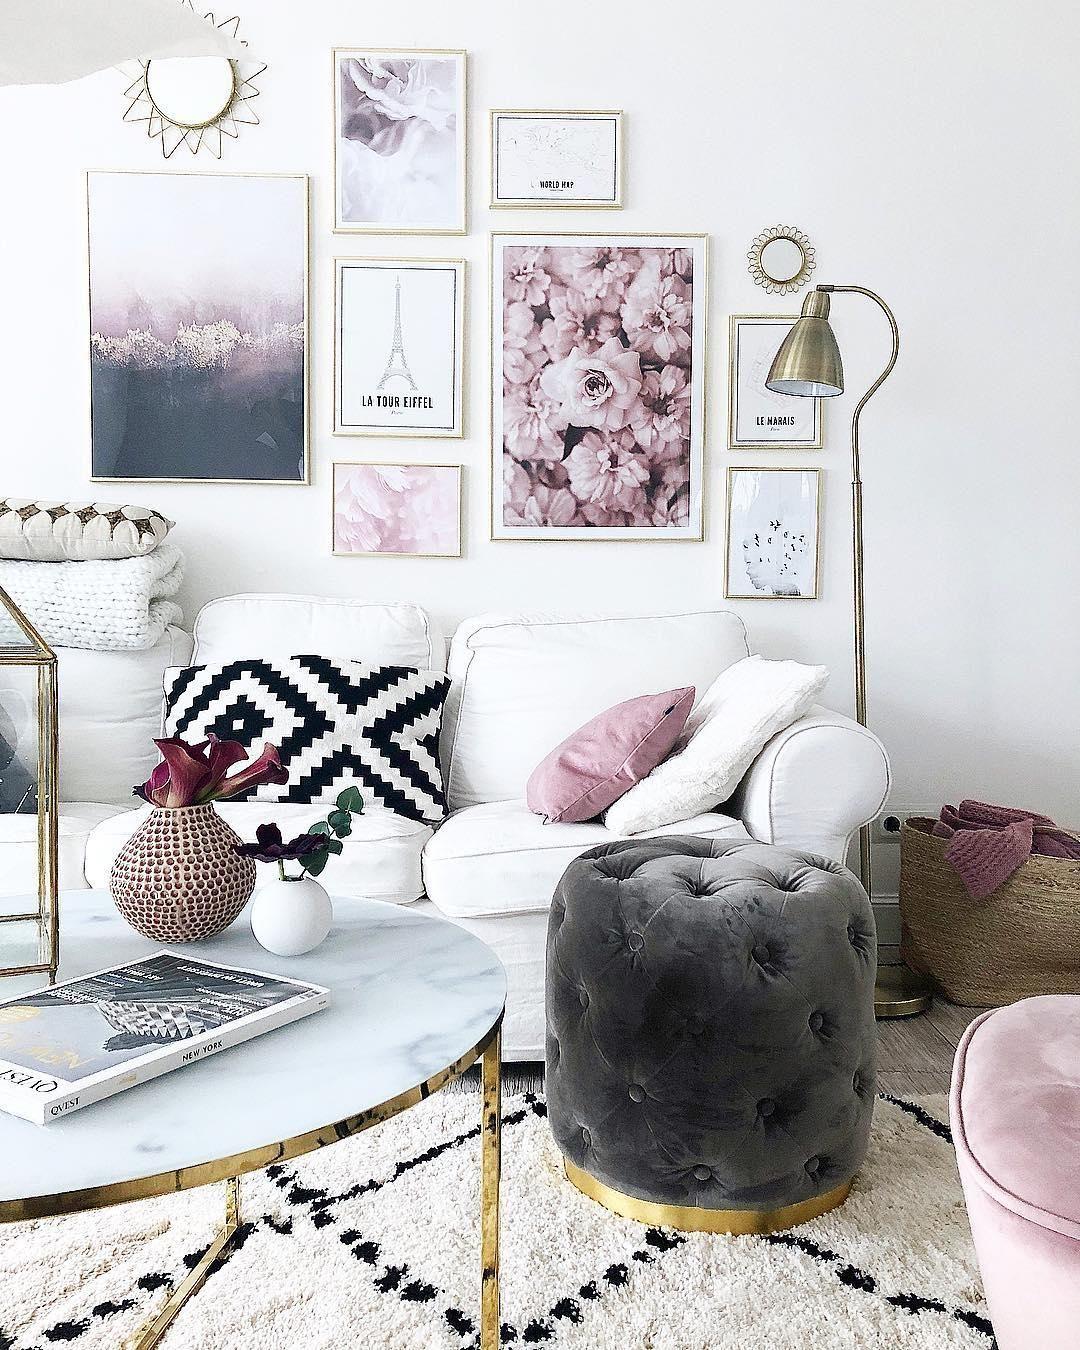 580 Living room ideas | living room designs, living room decor